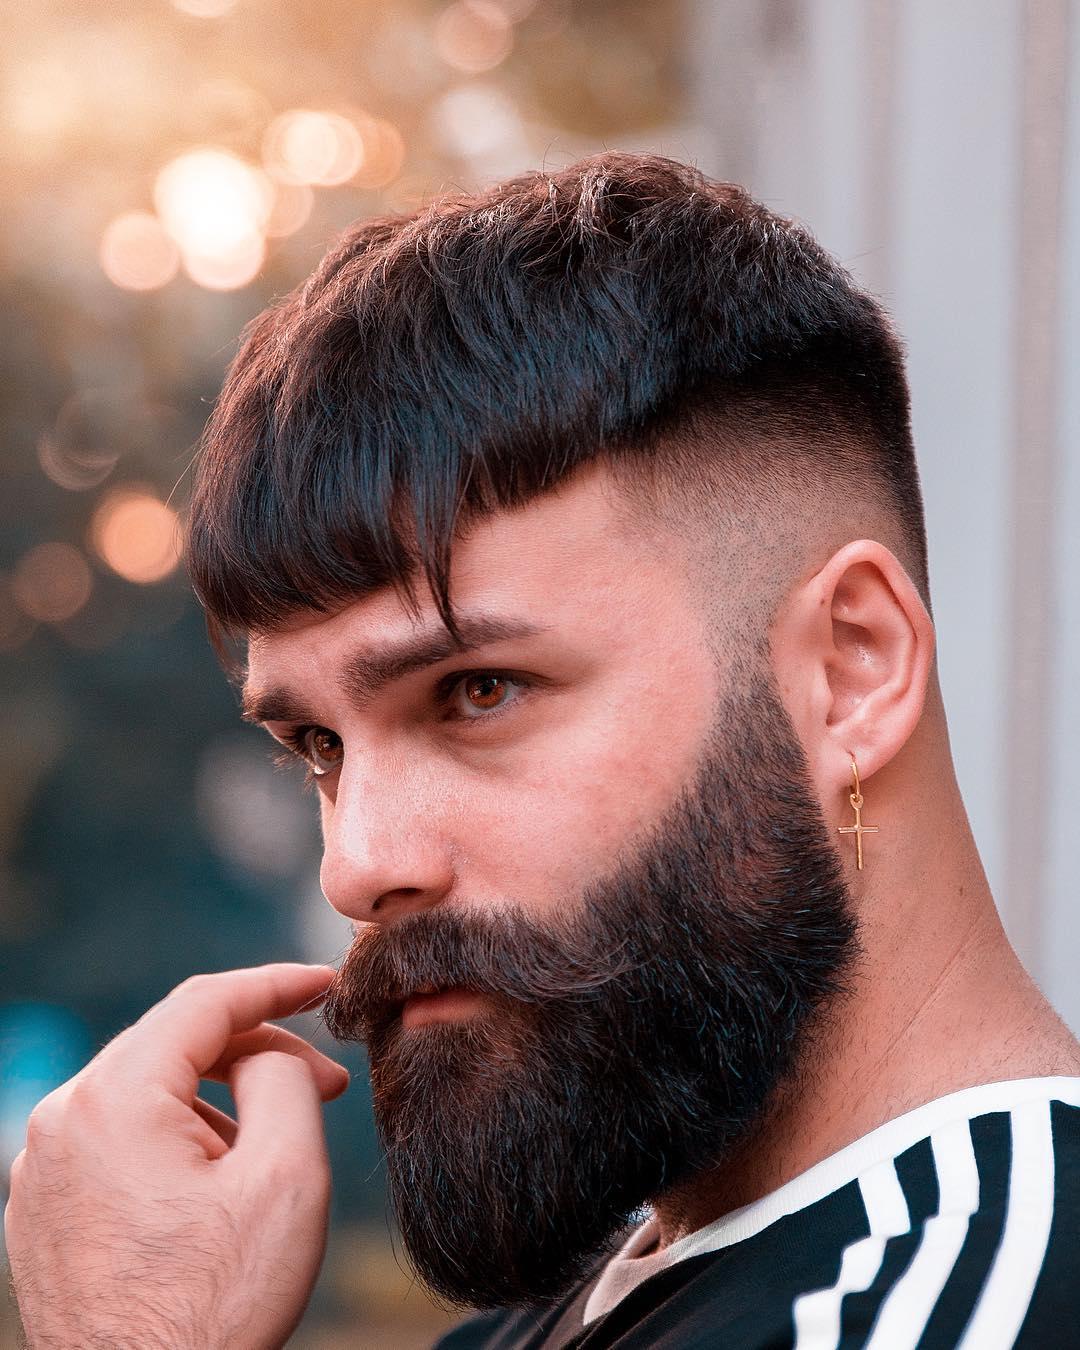 Crop Haircut And Full Beard